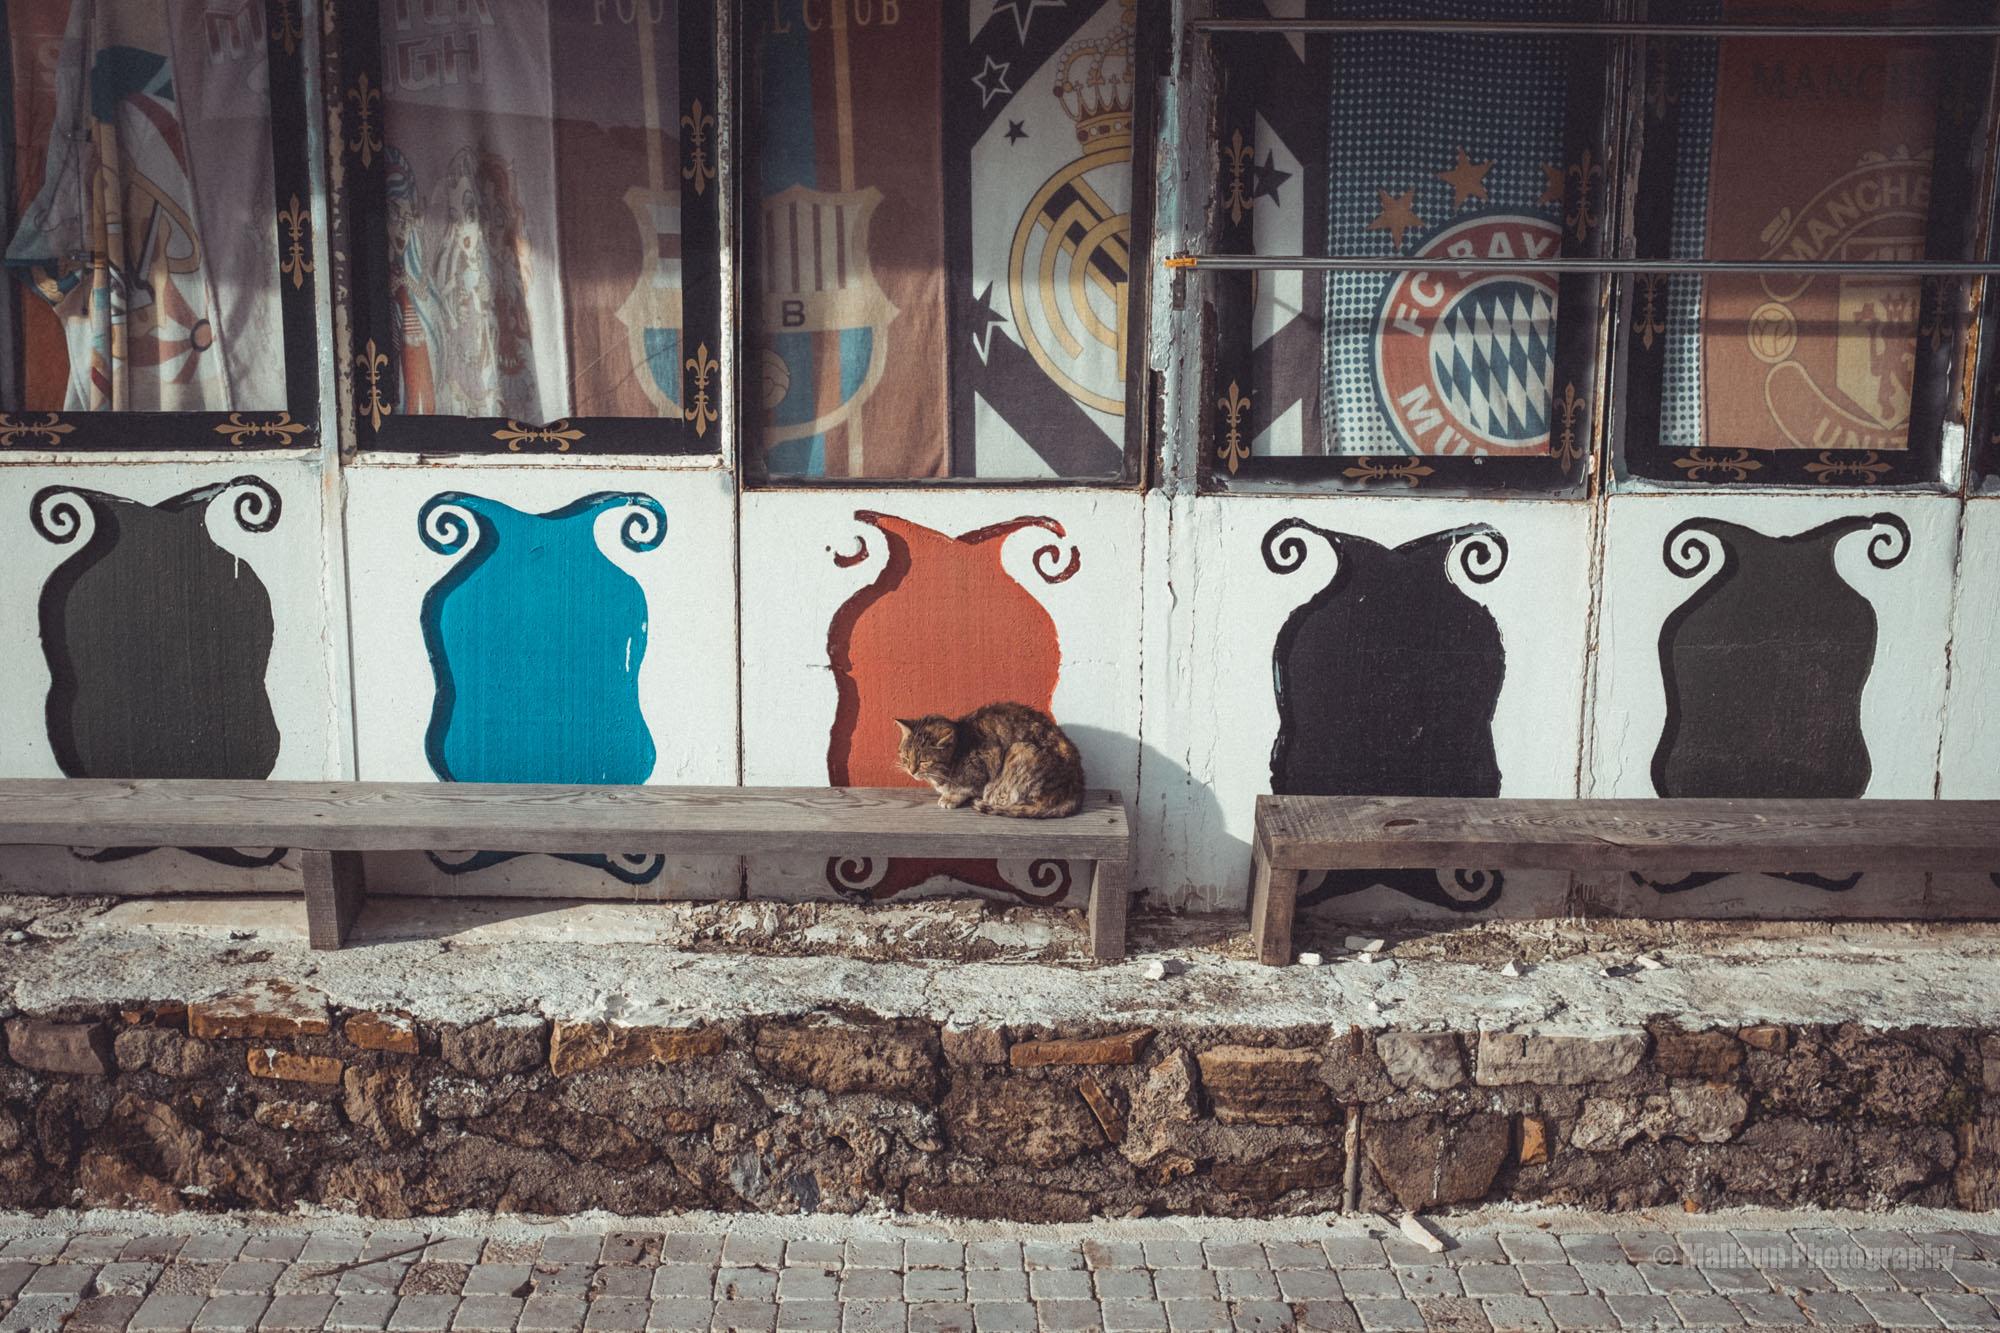 Stilleben im verlassenen Touristenort © Mallaun Photographs